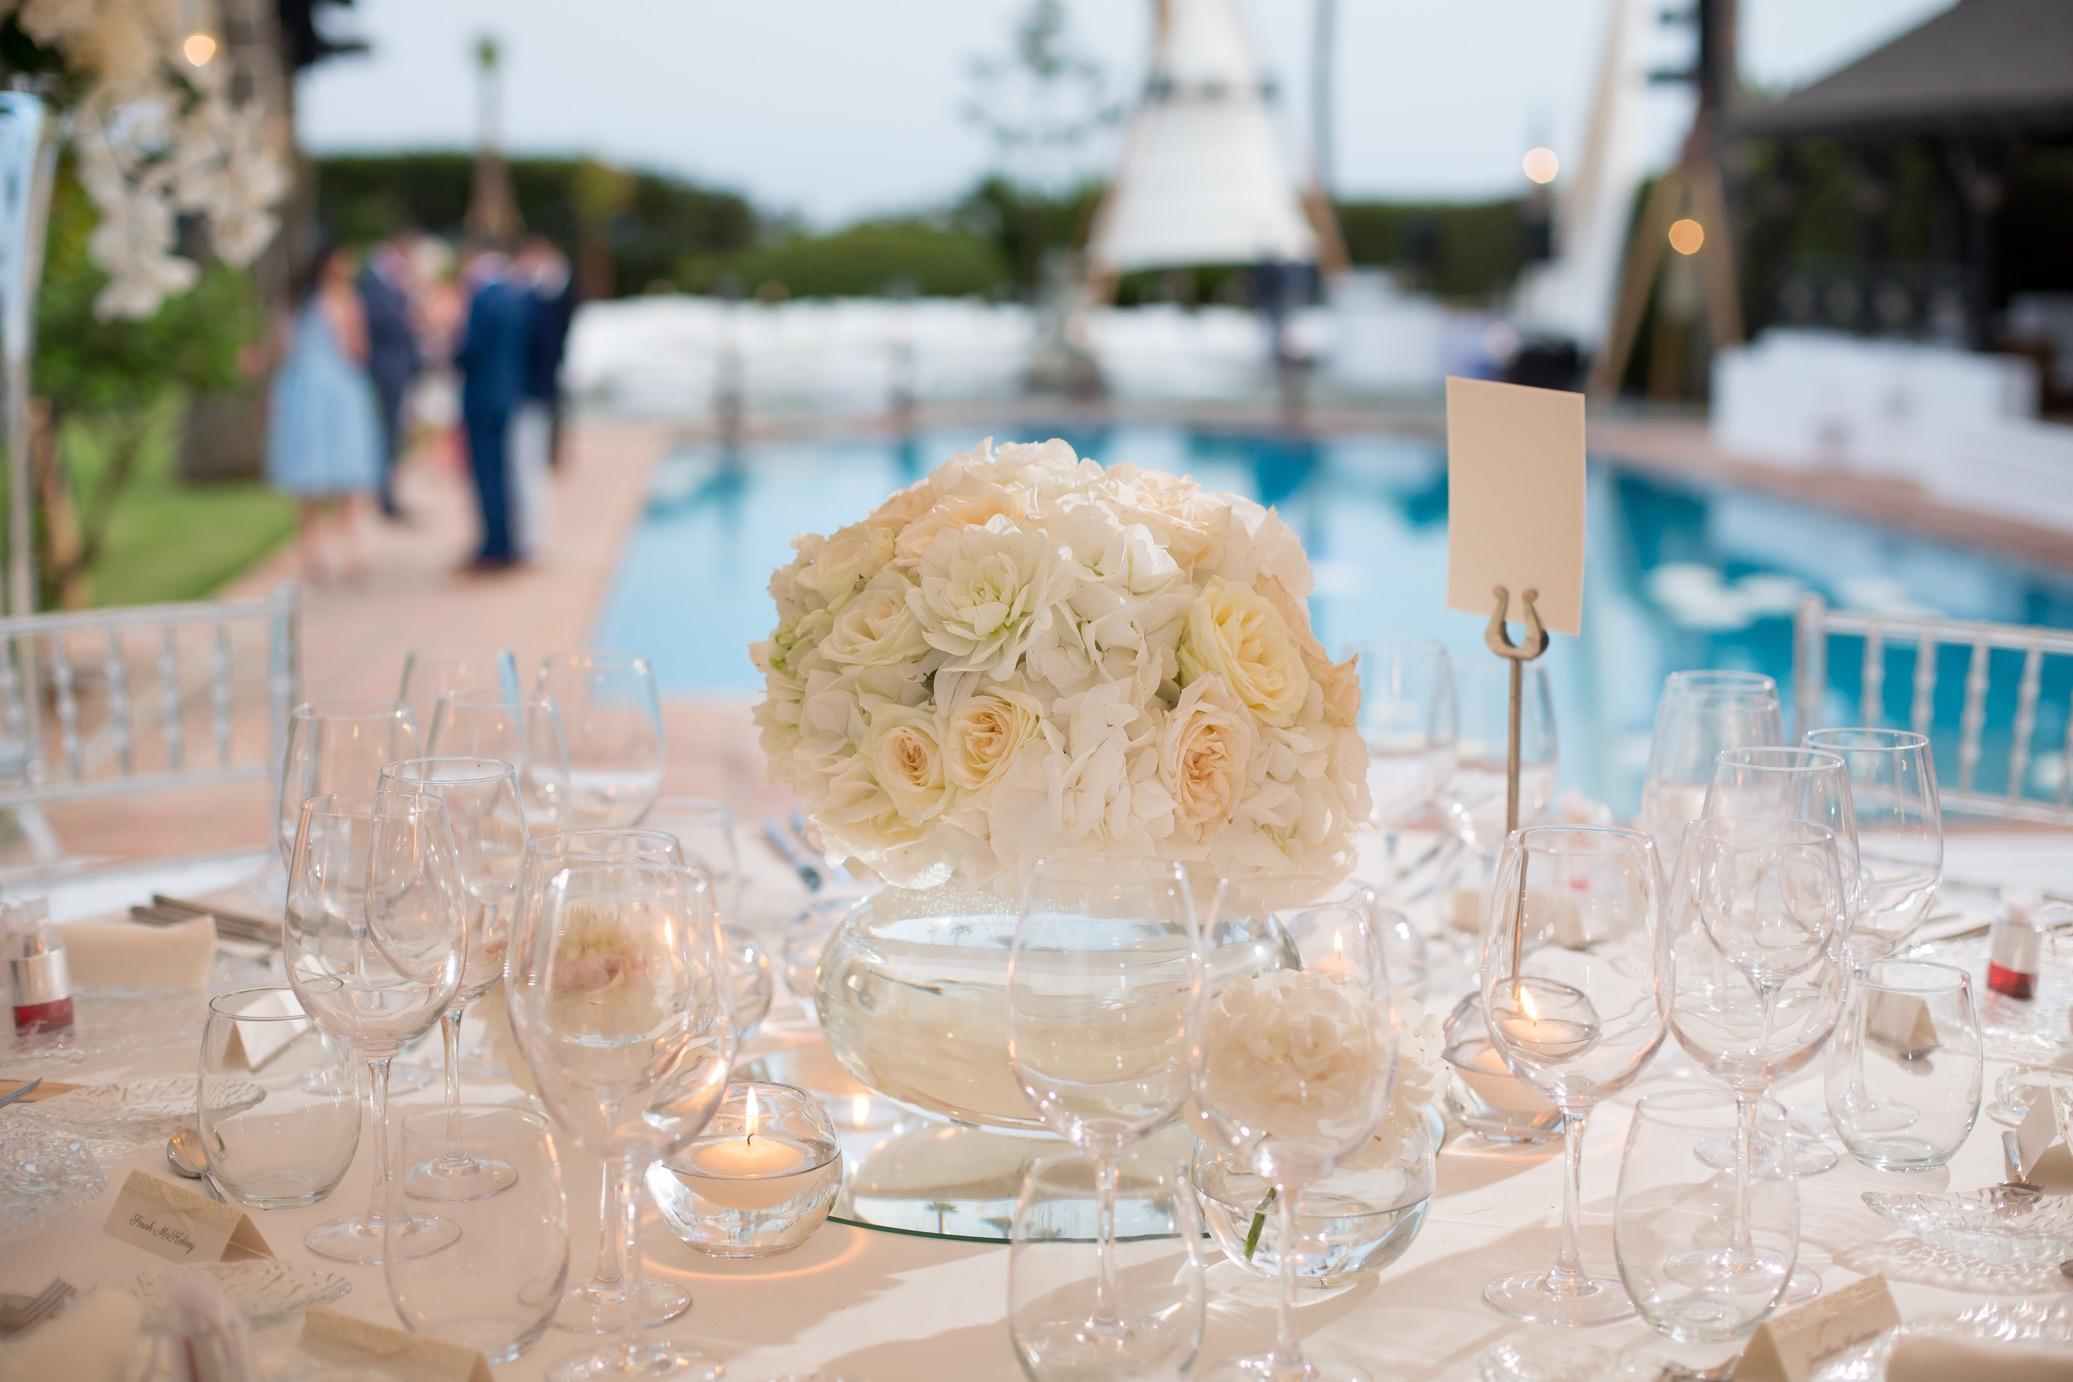 Si-Quiero-Wedding-Planner-By-Sira-Antequera-Bodas-Málaga-Marbella-Miami-02